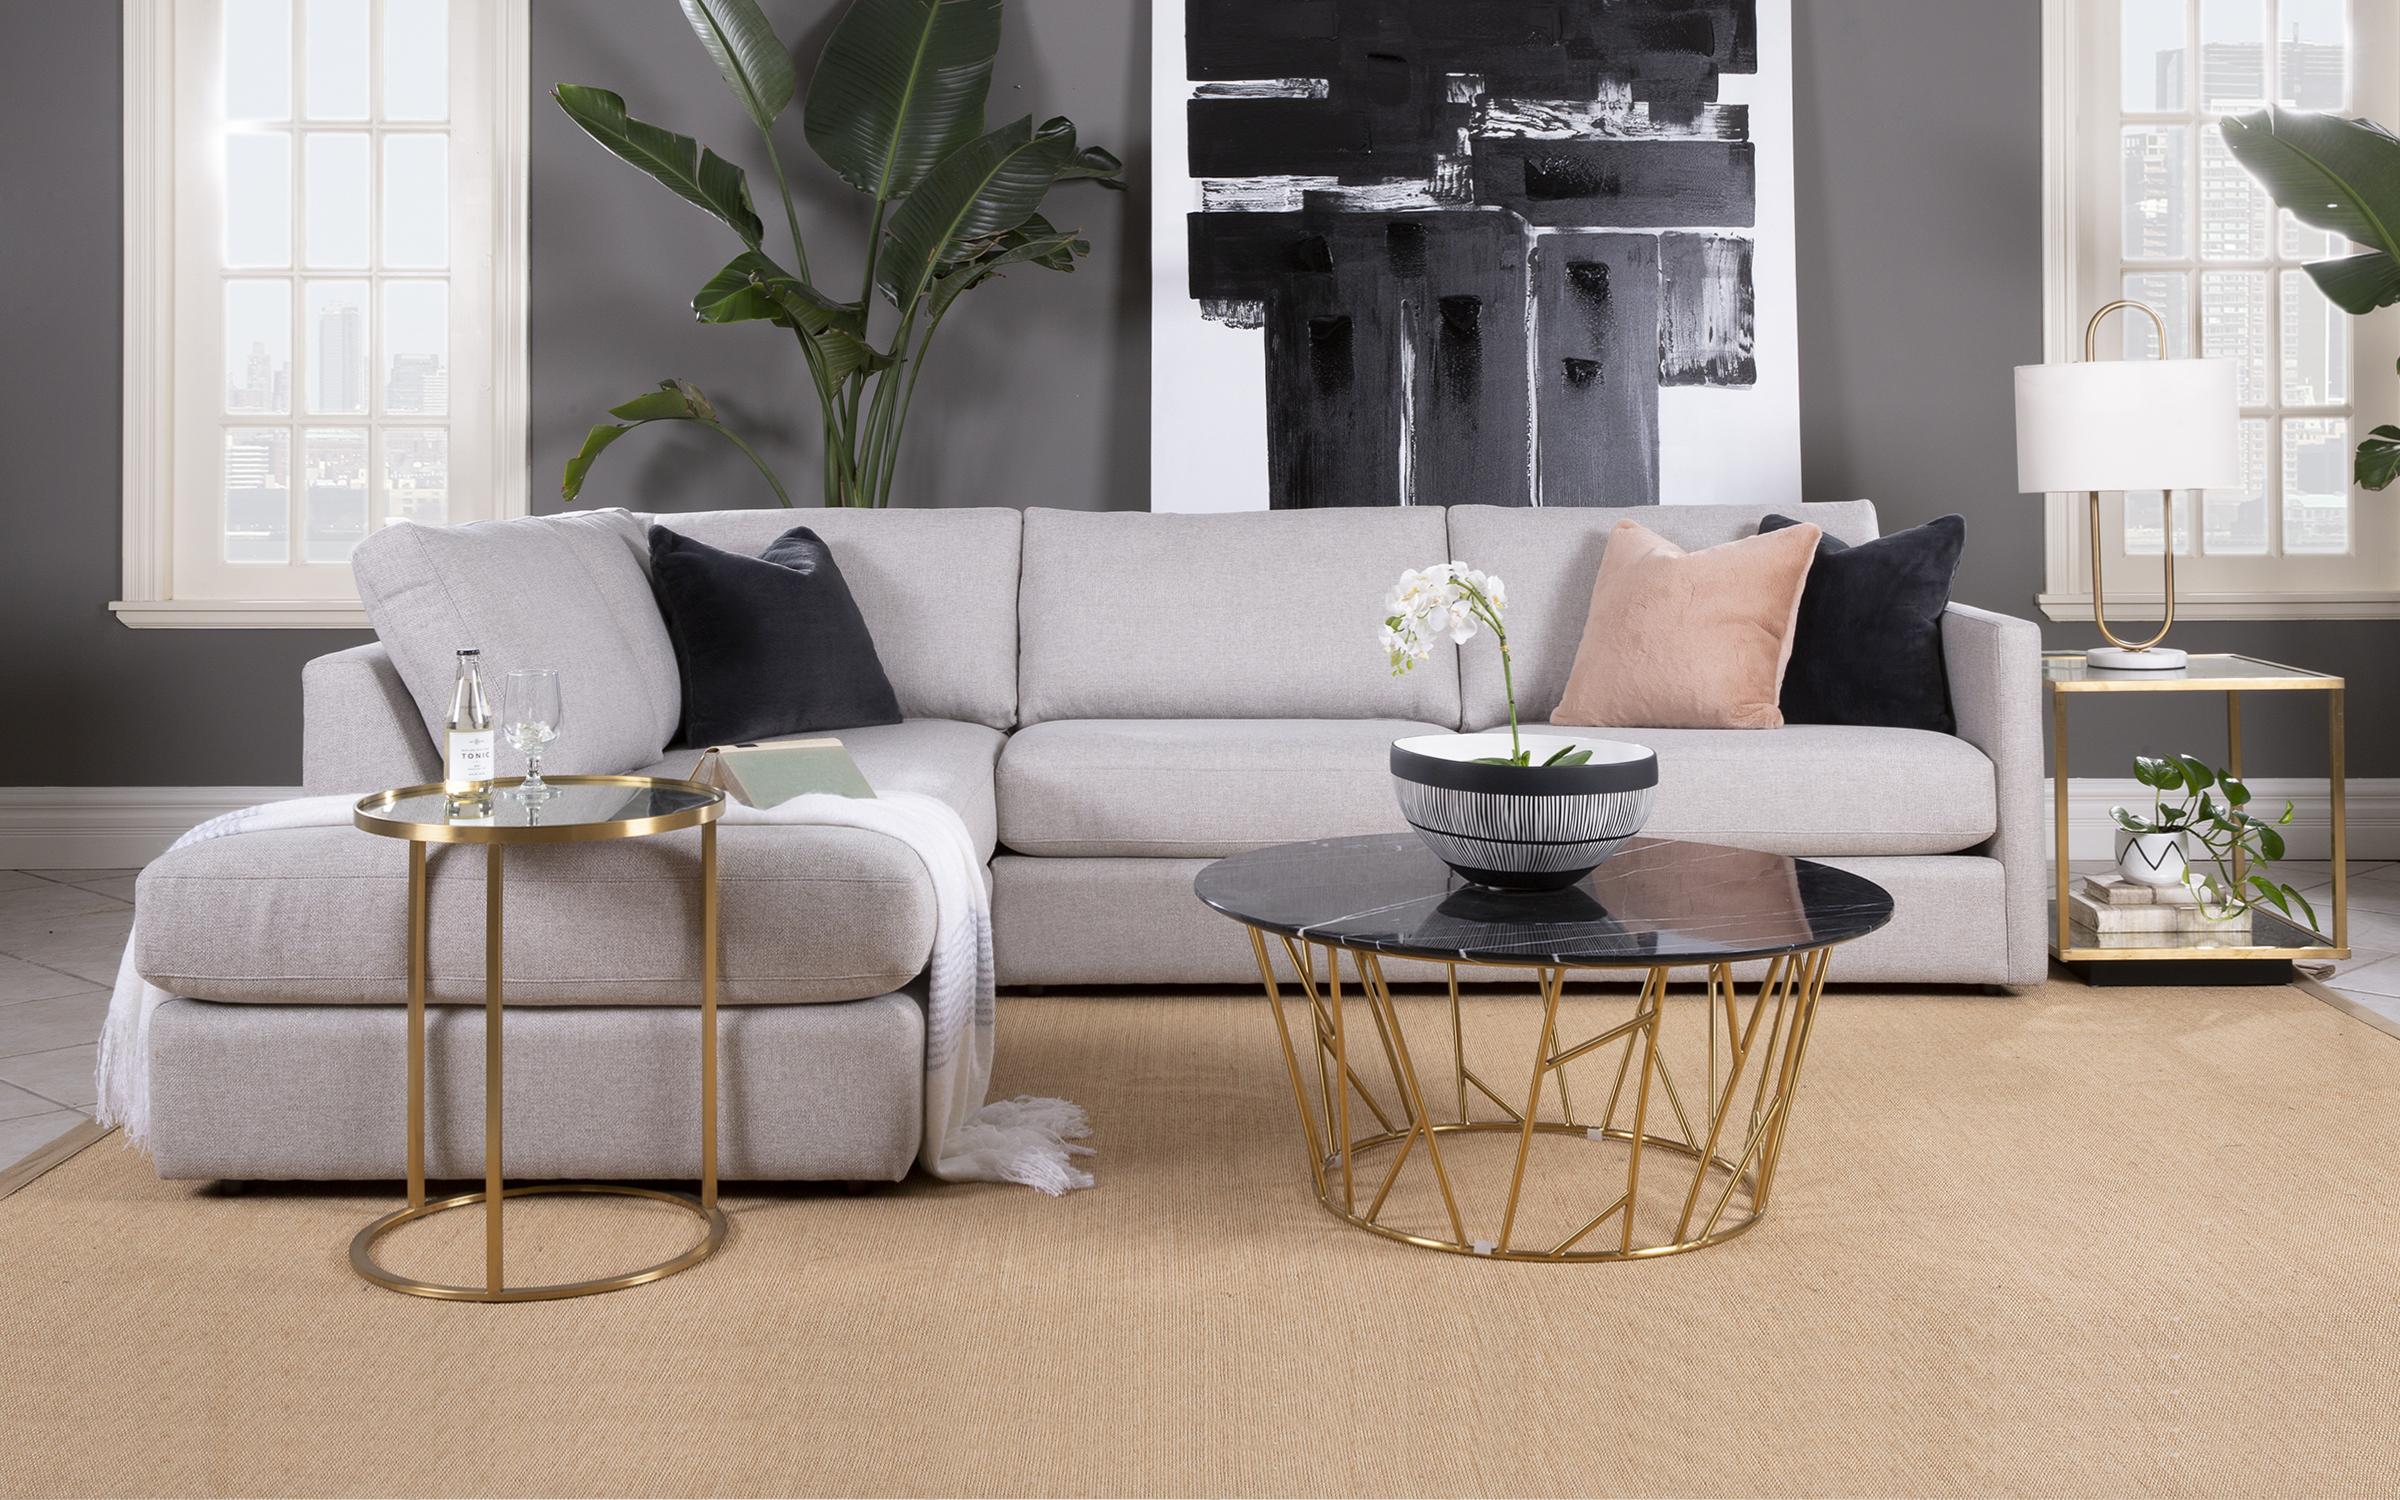 Decor Rest Furniture Ltd A Leading Canadian Manufacturer Of Fine Upholstery